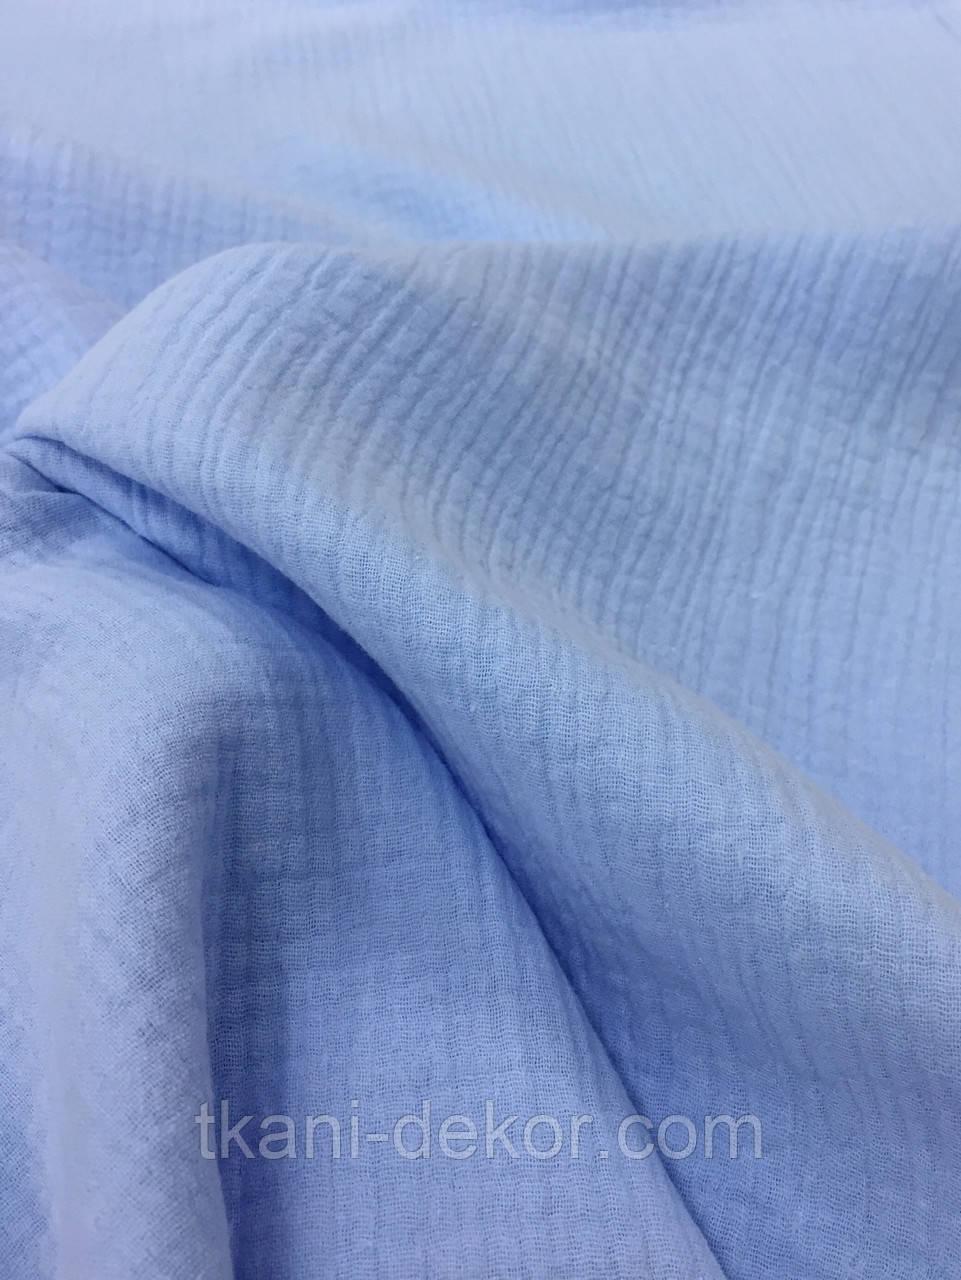 Муслин (хлопковая ткань) жатка голубой однотон (ширина 1,35 м)